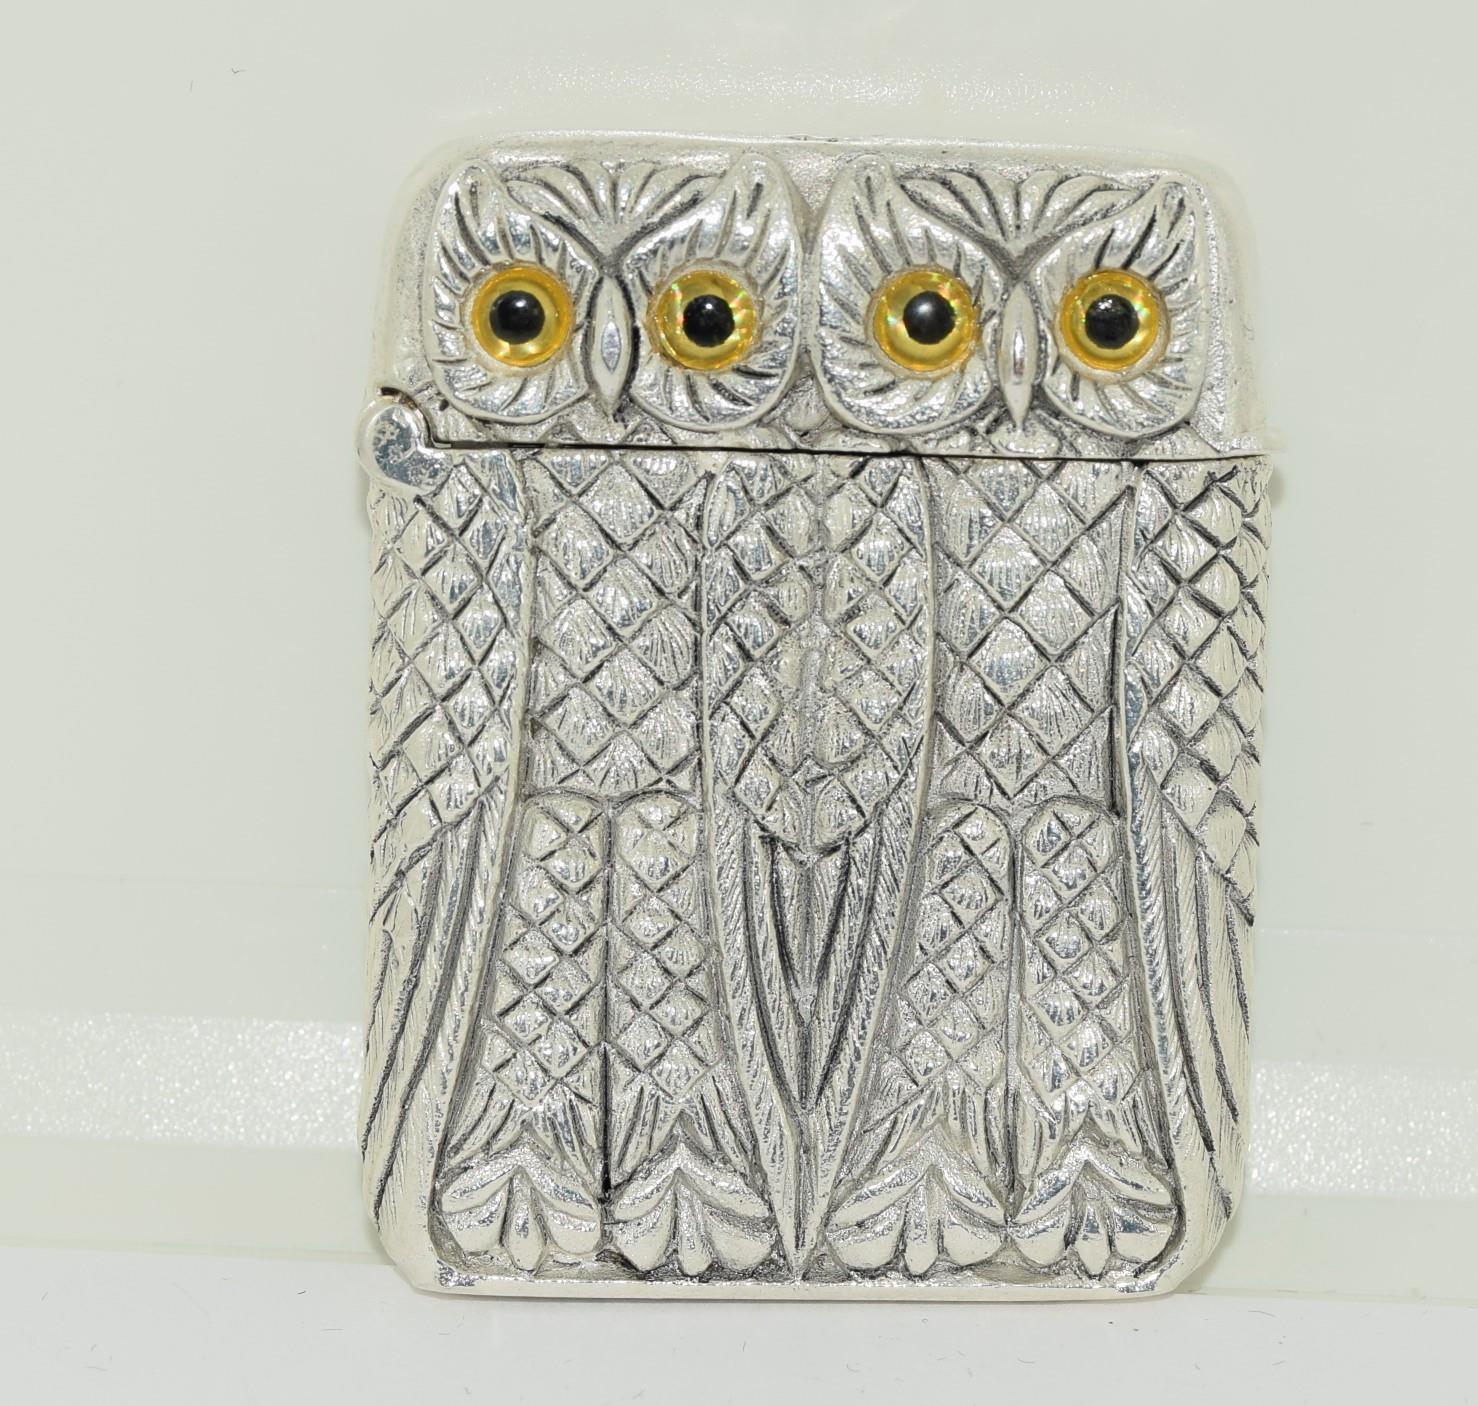 Silver plated owl vesta case